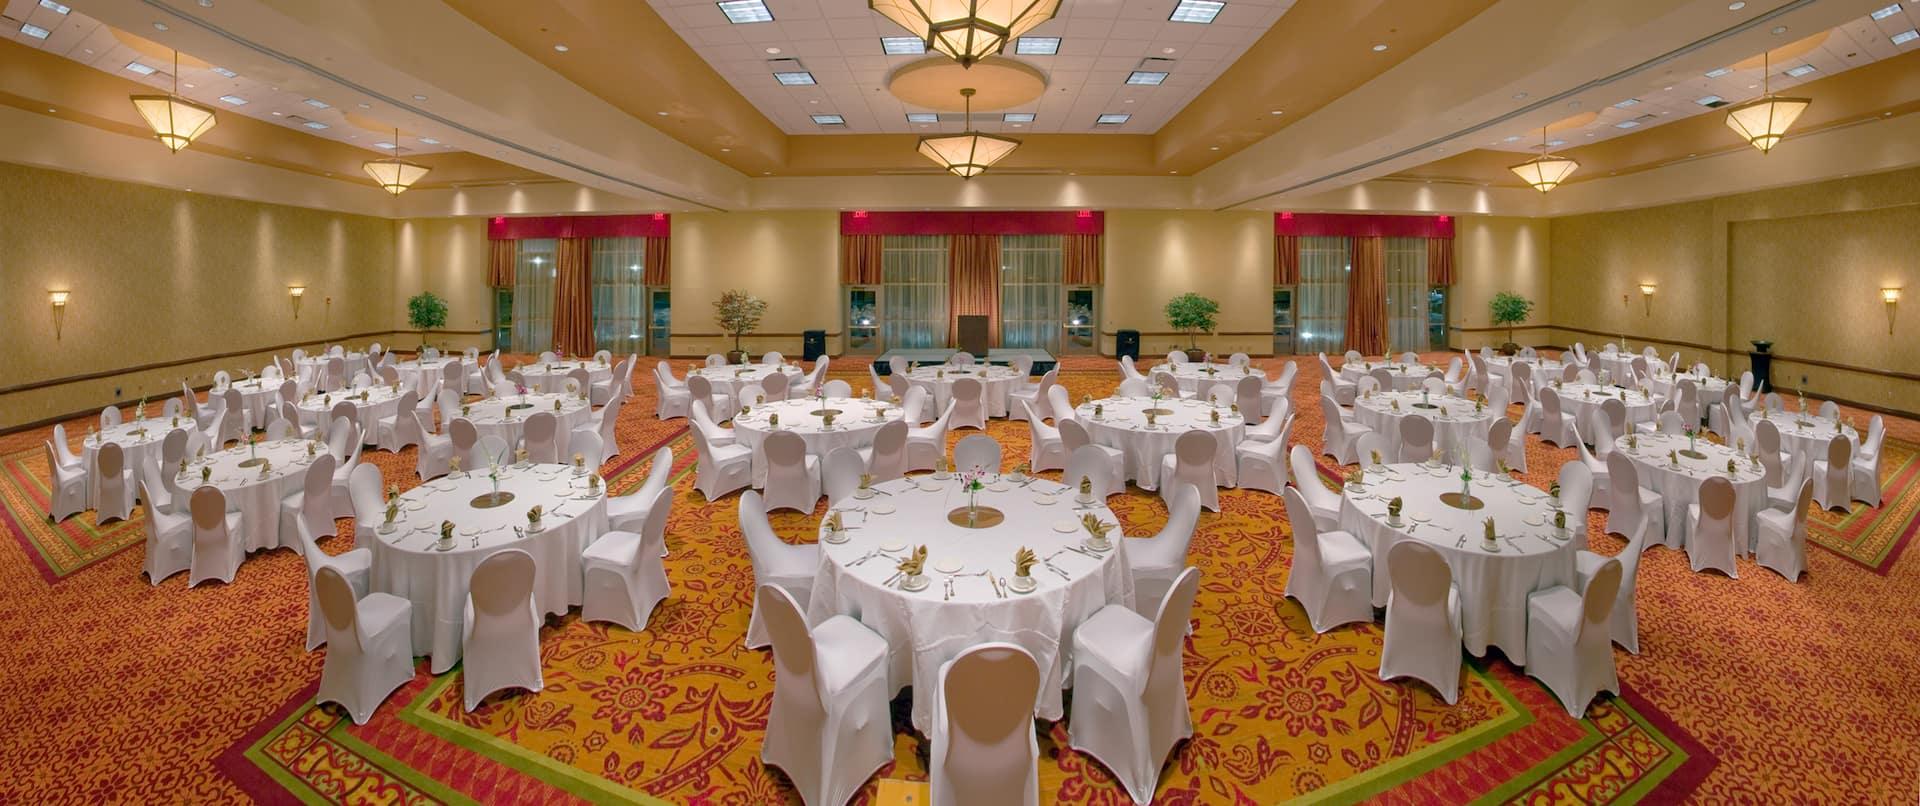 University Banquet Setup